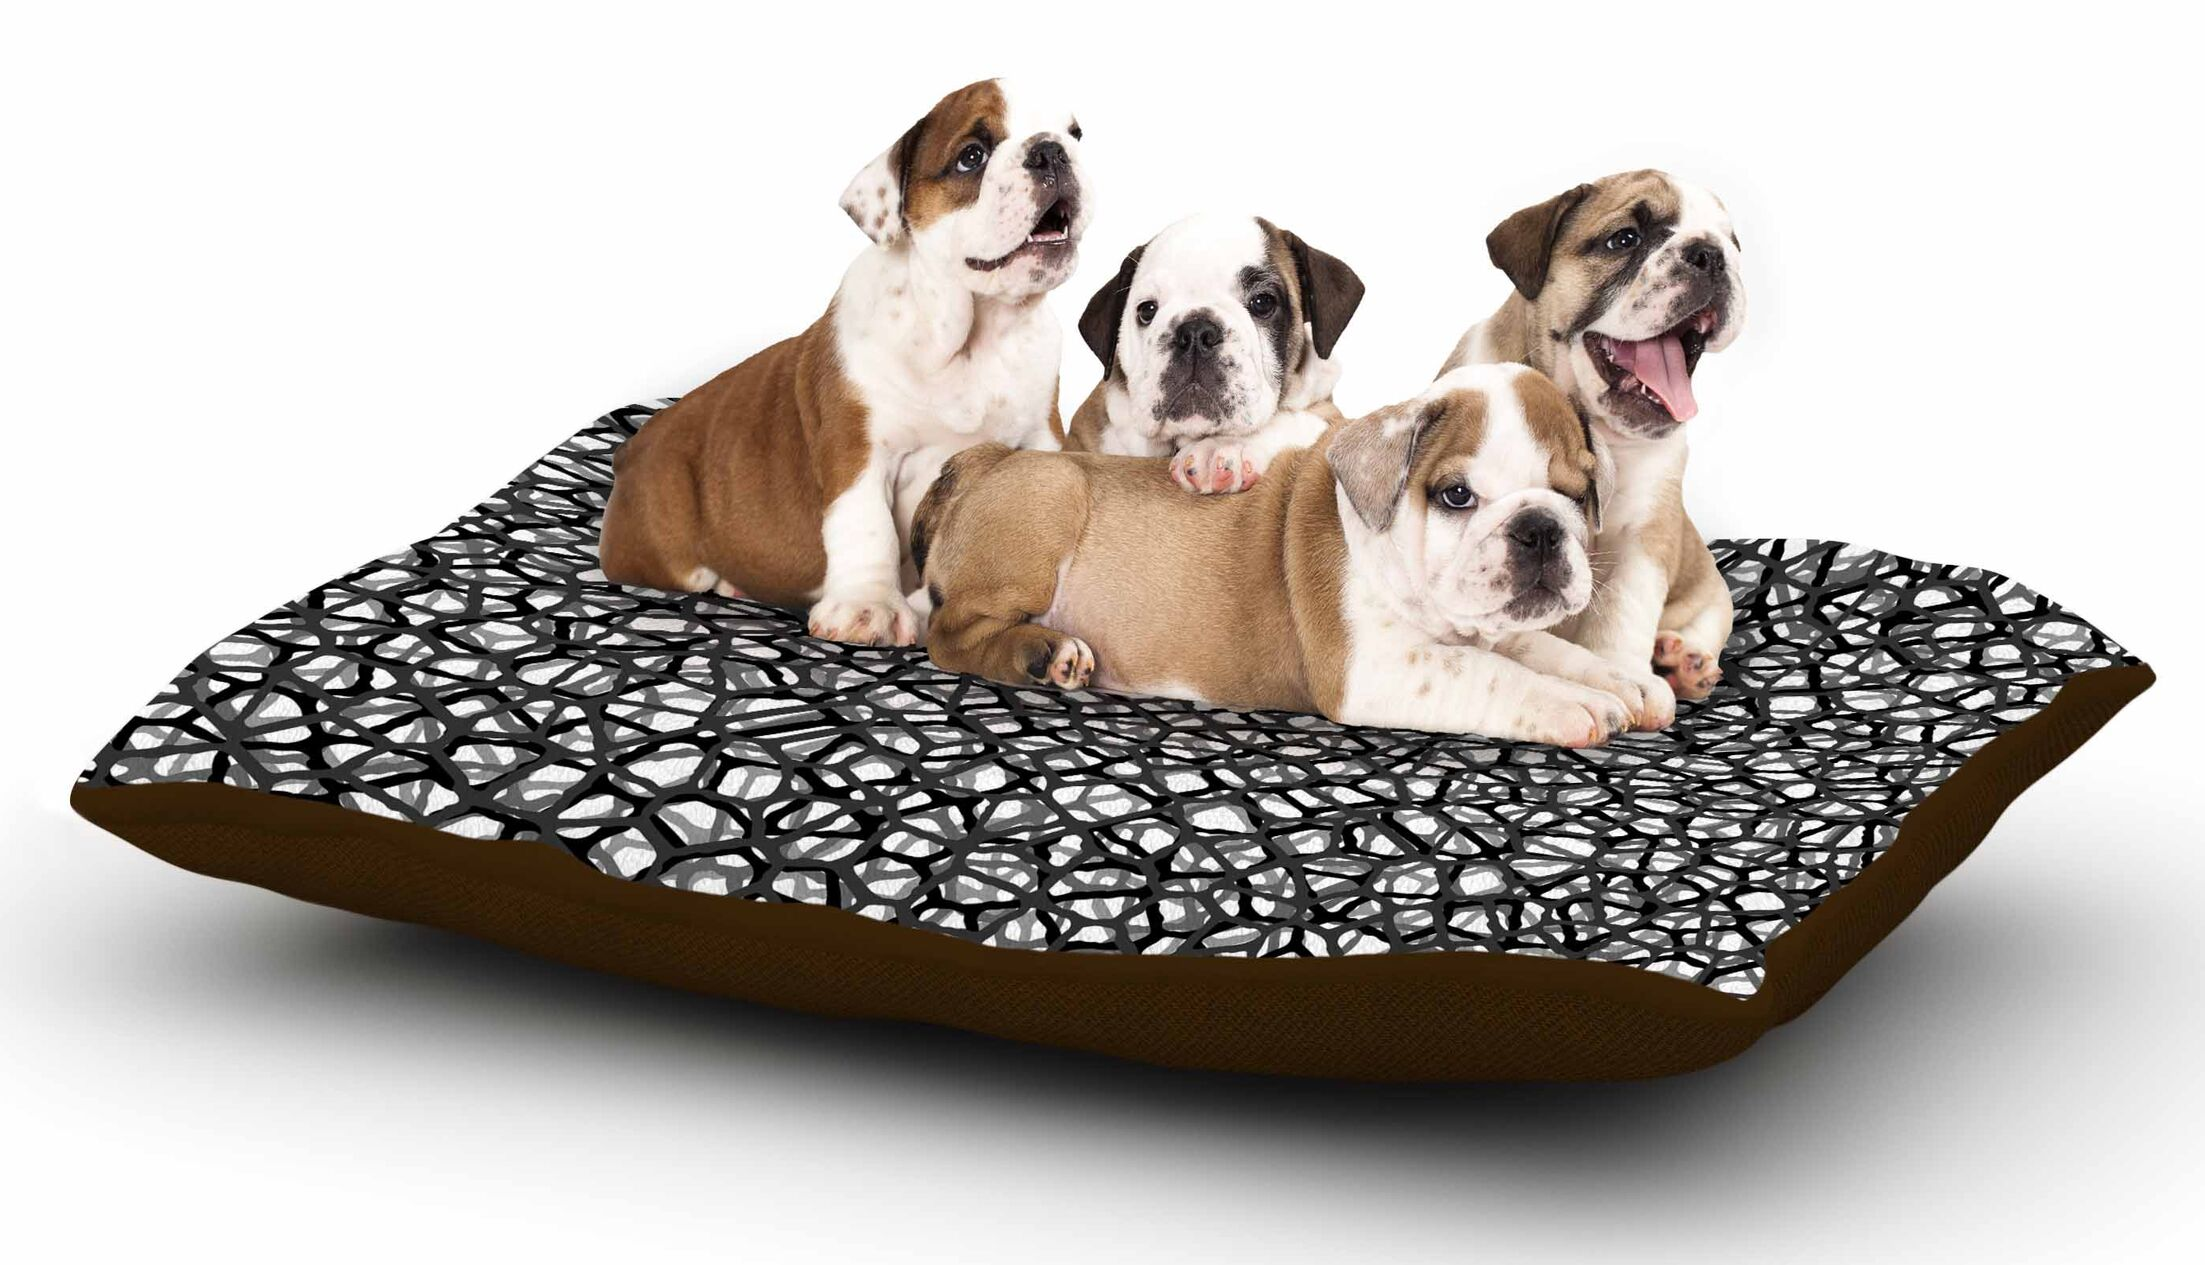 Trebam 'Staklo (Grays)' Digital Dog Pillow with Fleece Cozy Top